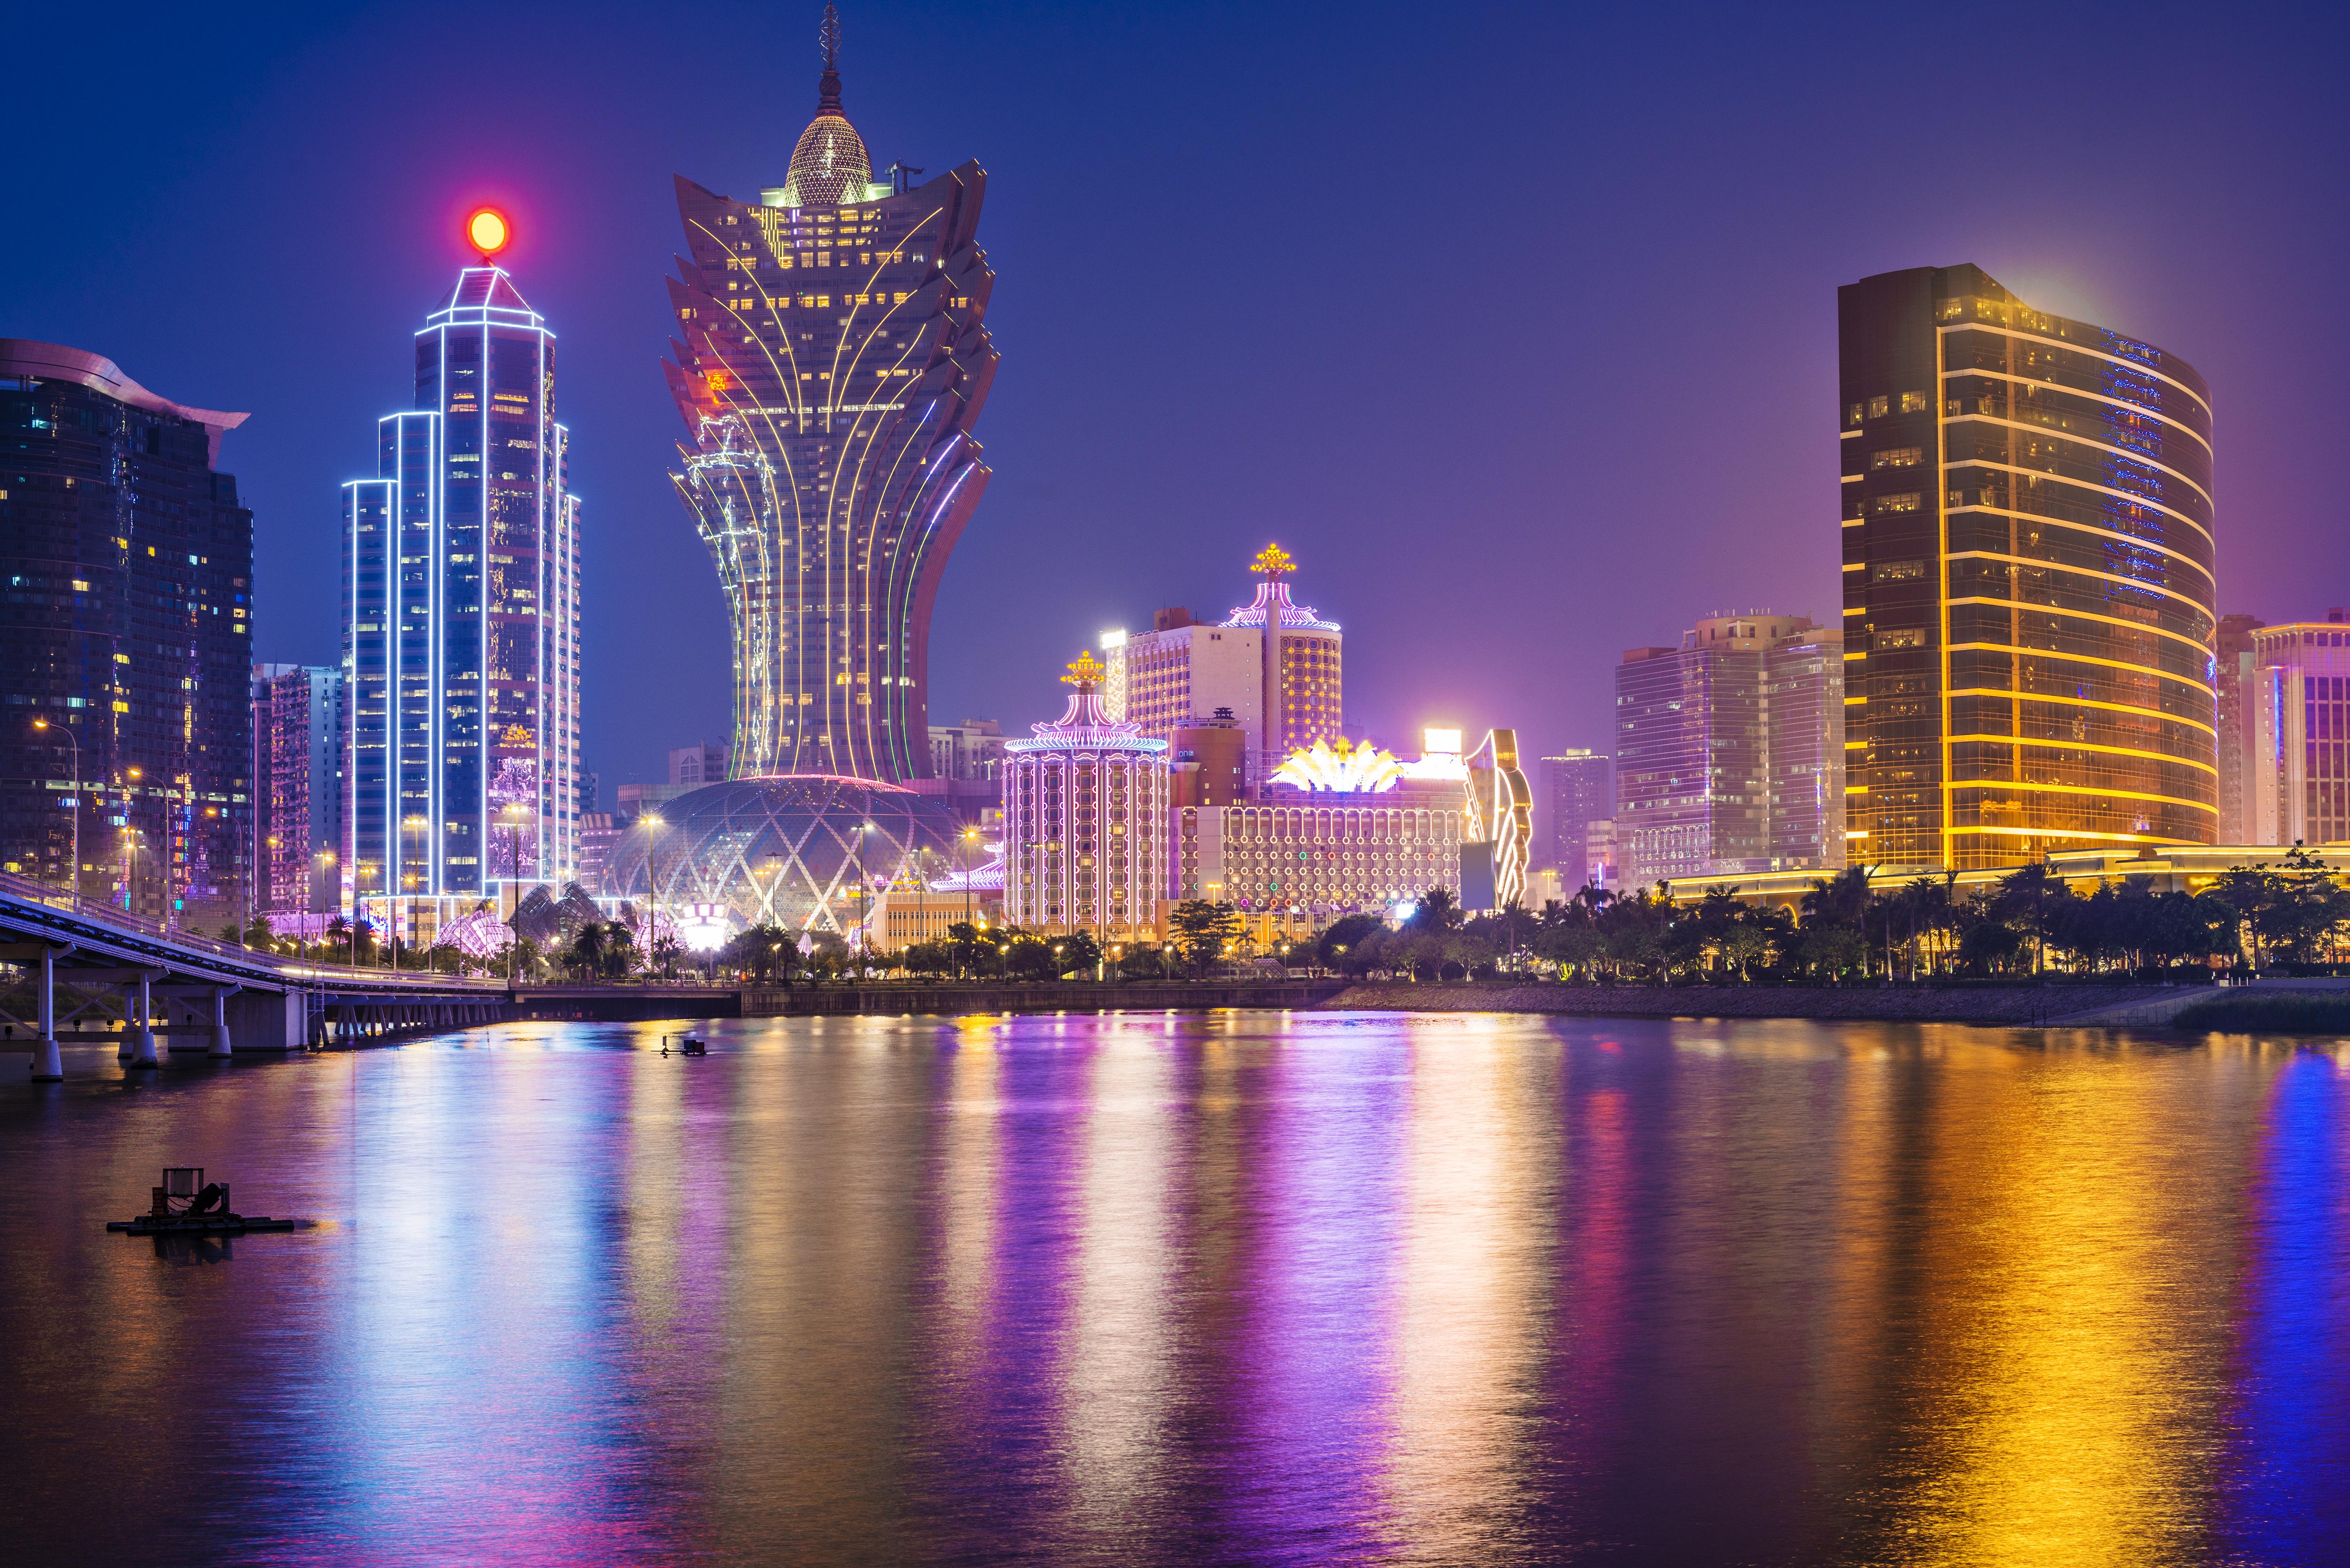 Macau's skyline with Wynn Macau in the foreground.